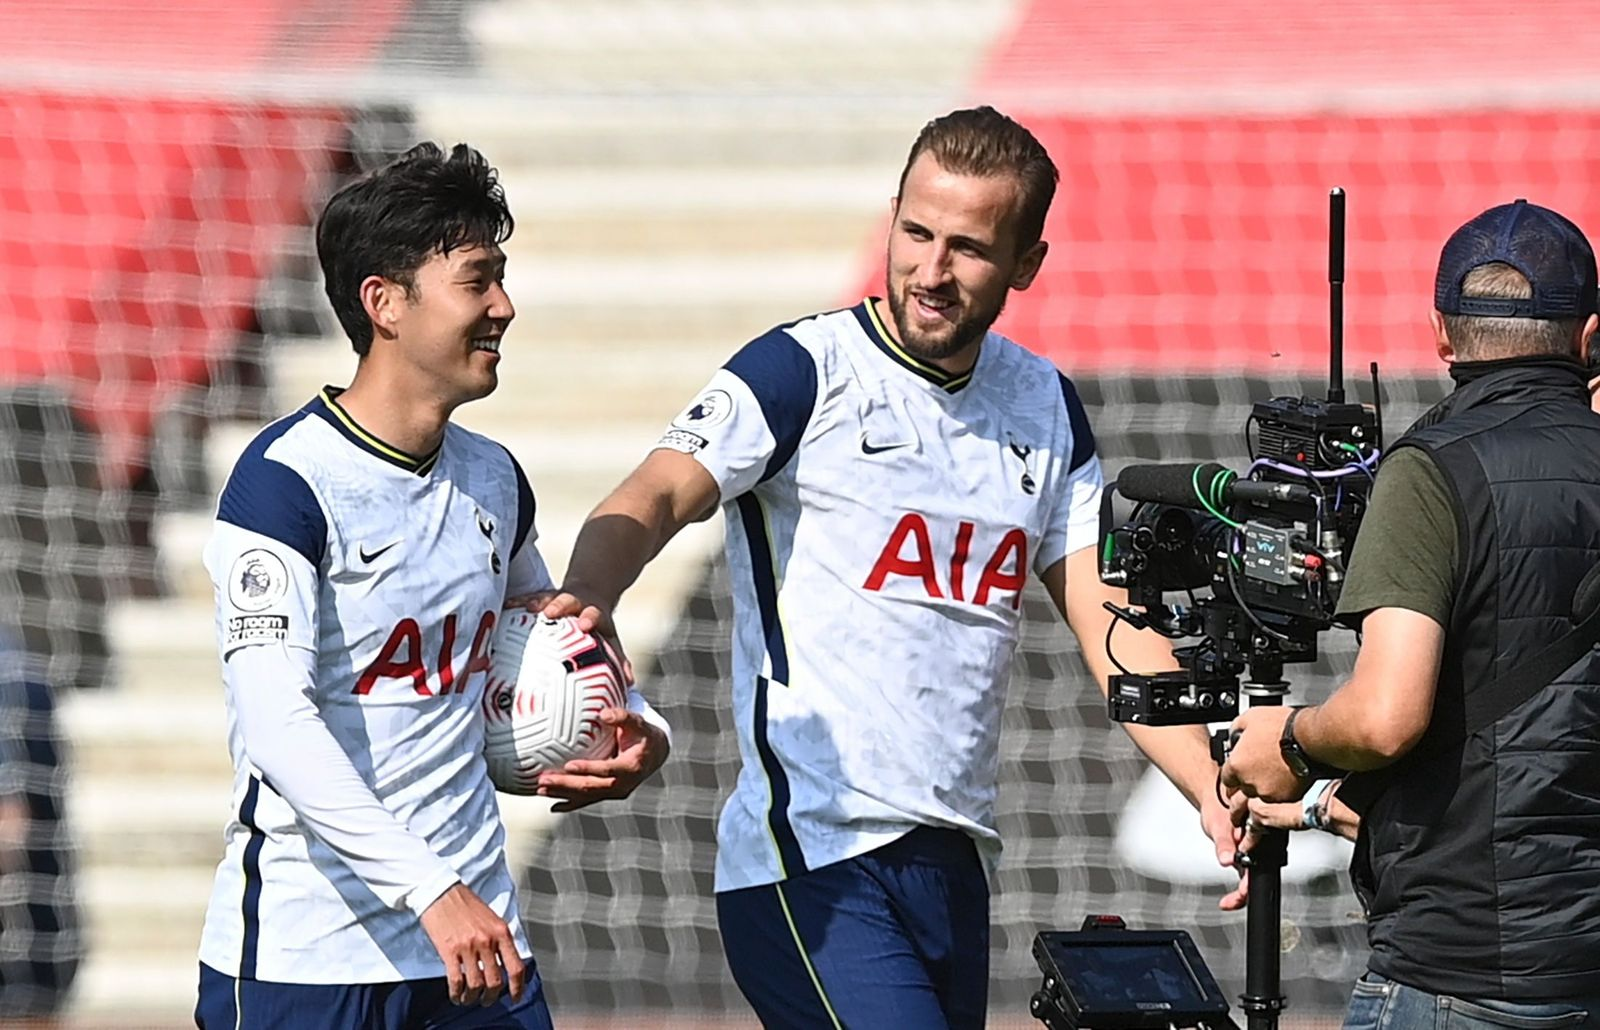 Southampton vs Tottenham Hotspur, United Kingdom - 20 Sep 2020